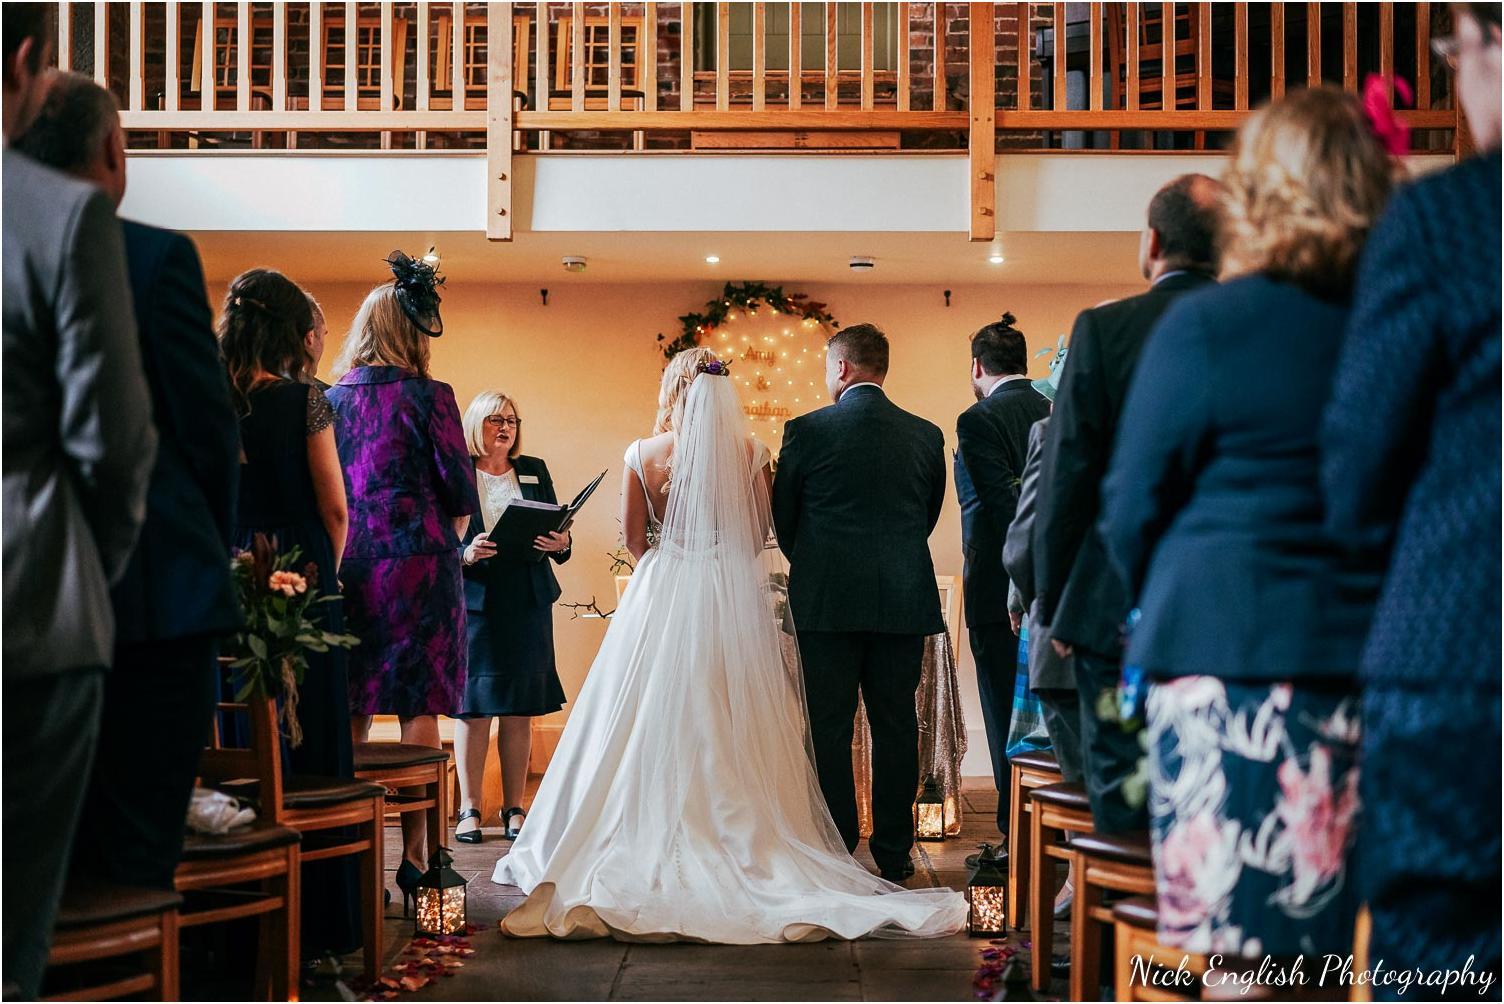 The_Ashes_Barn_Endon_Stoke_Wedding_Photographer-36.jpg